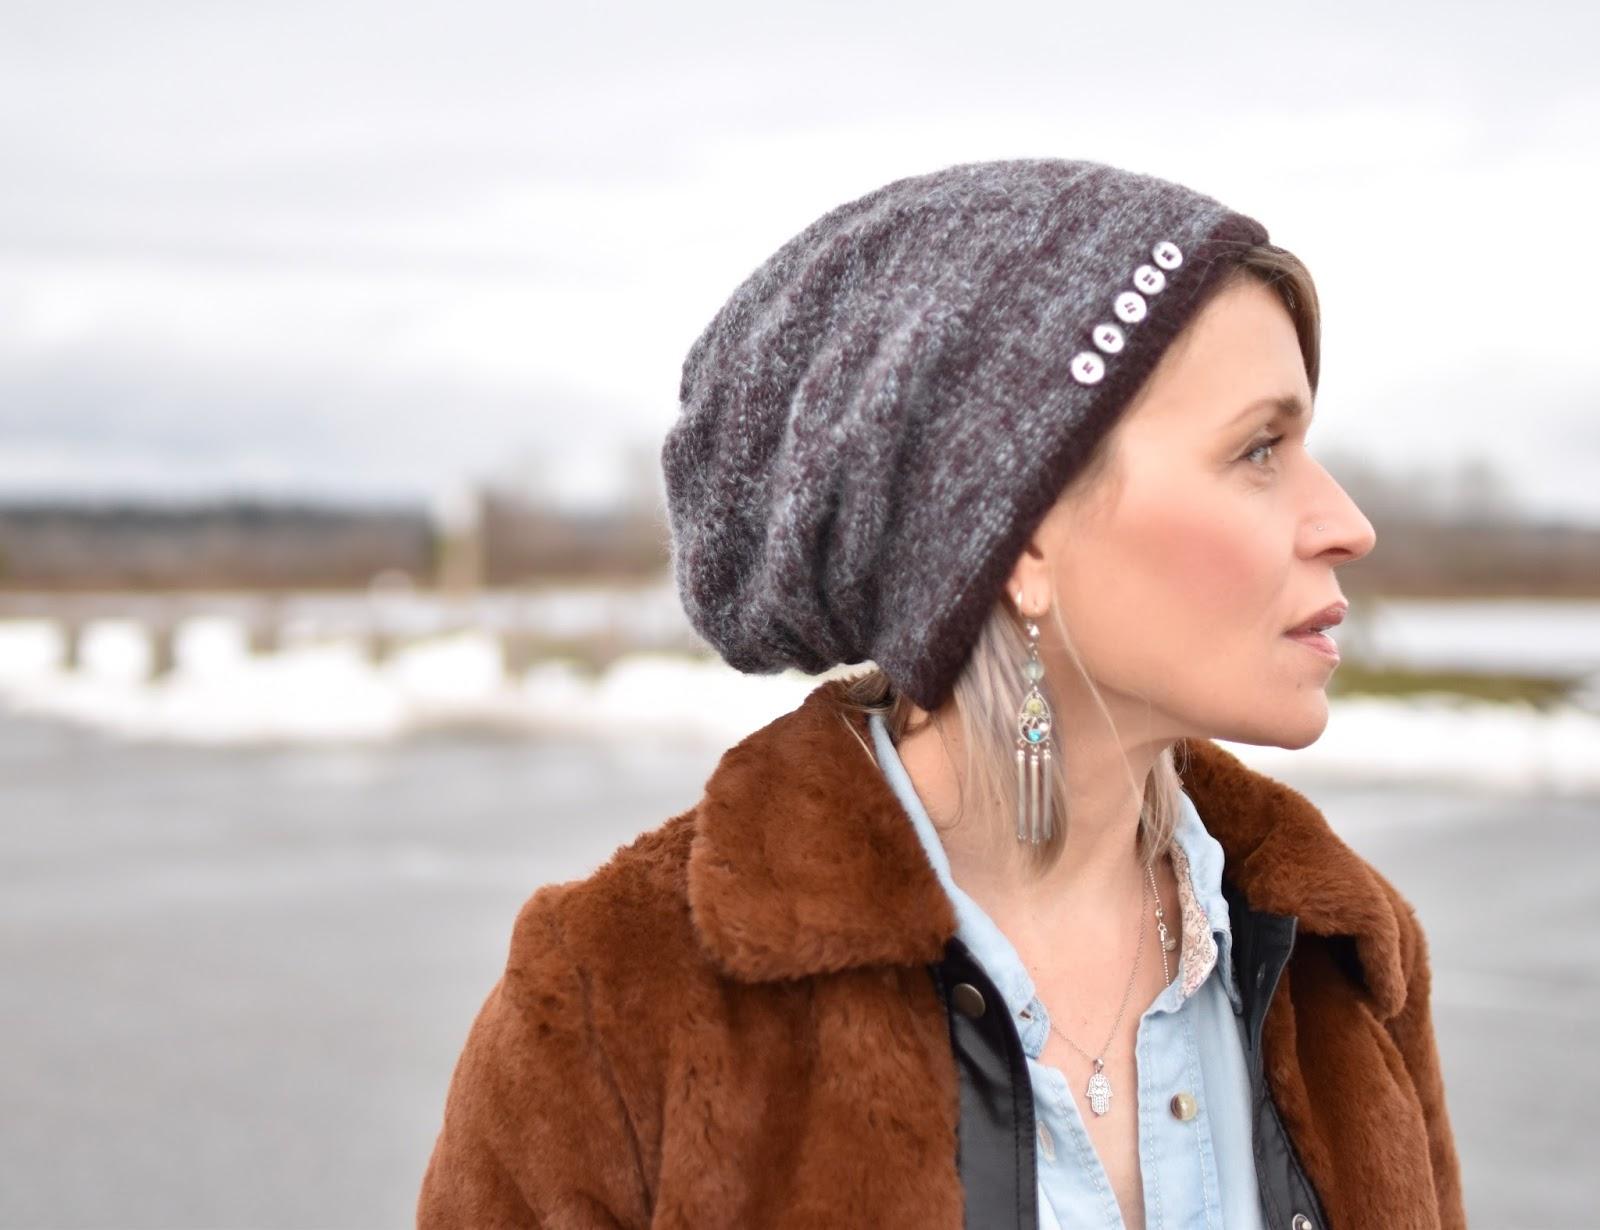 Monika Faulkner outfit inspiration - chambray shirt, furry bomber, woolen beanie